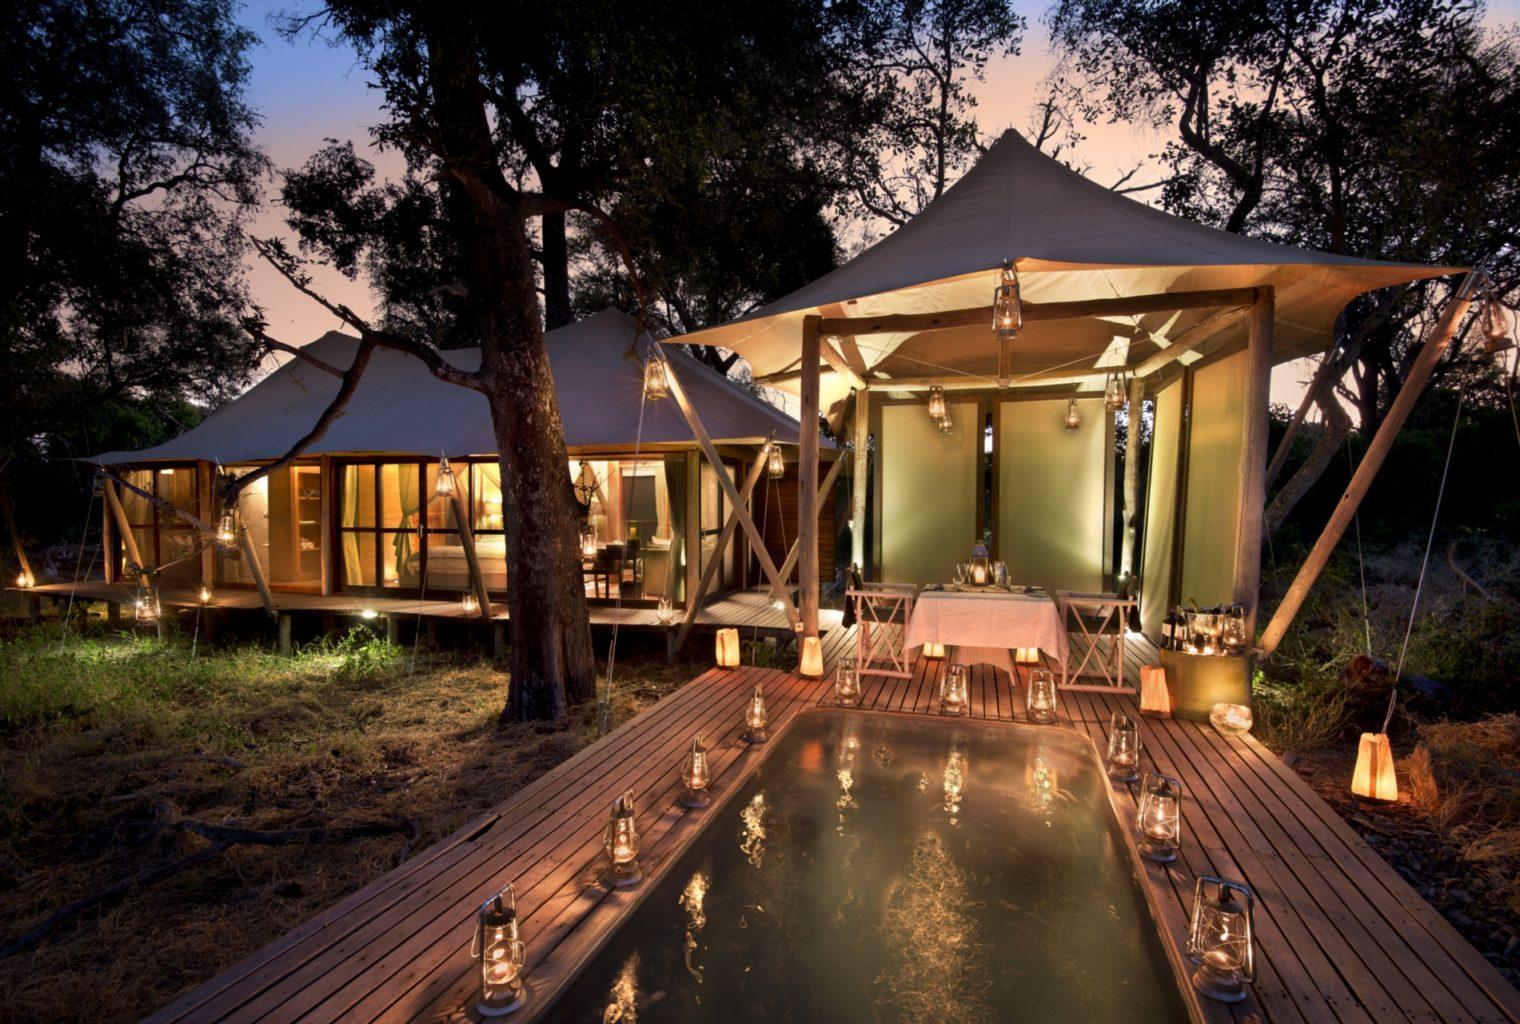 &Beyond, Xaranna, Okavango Delta, Camp, Room 5